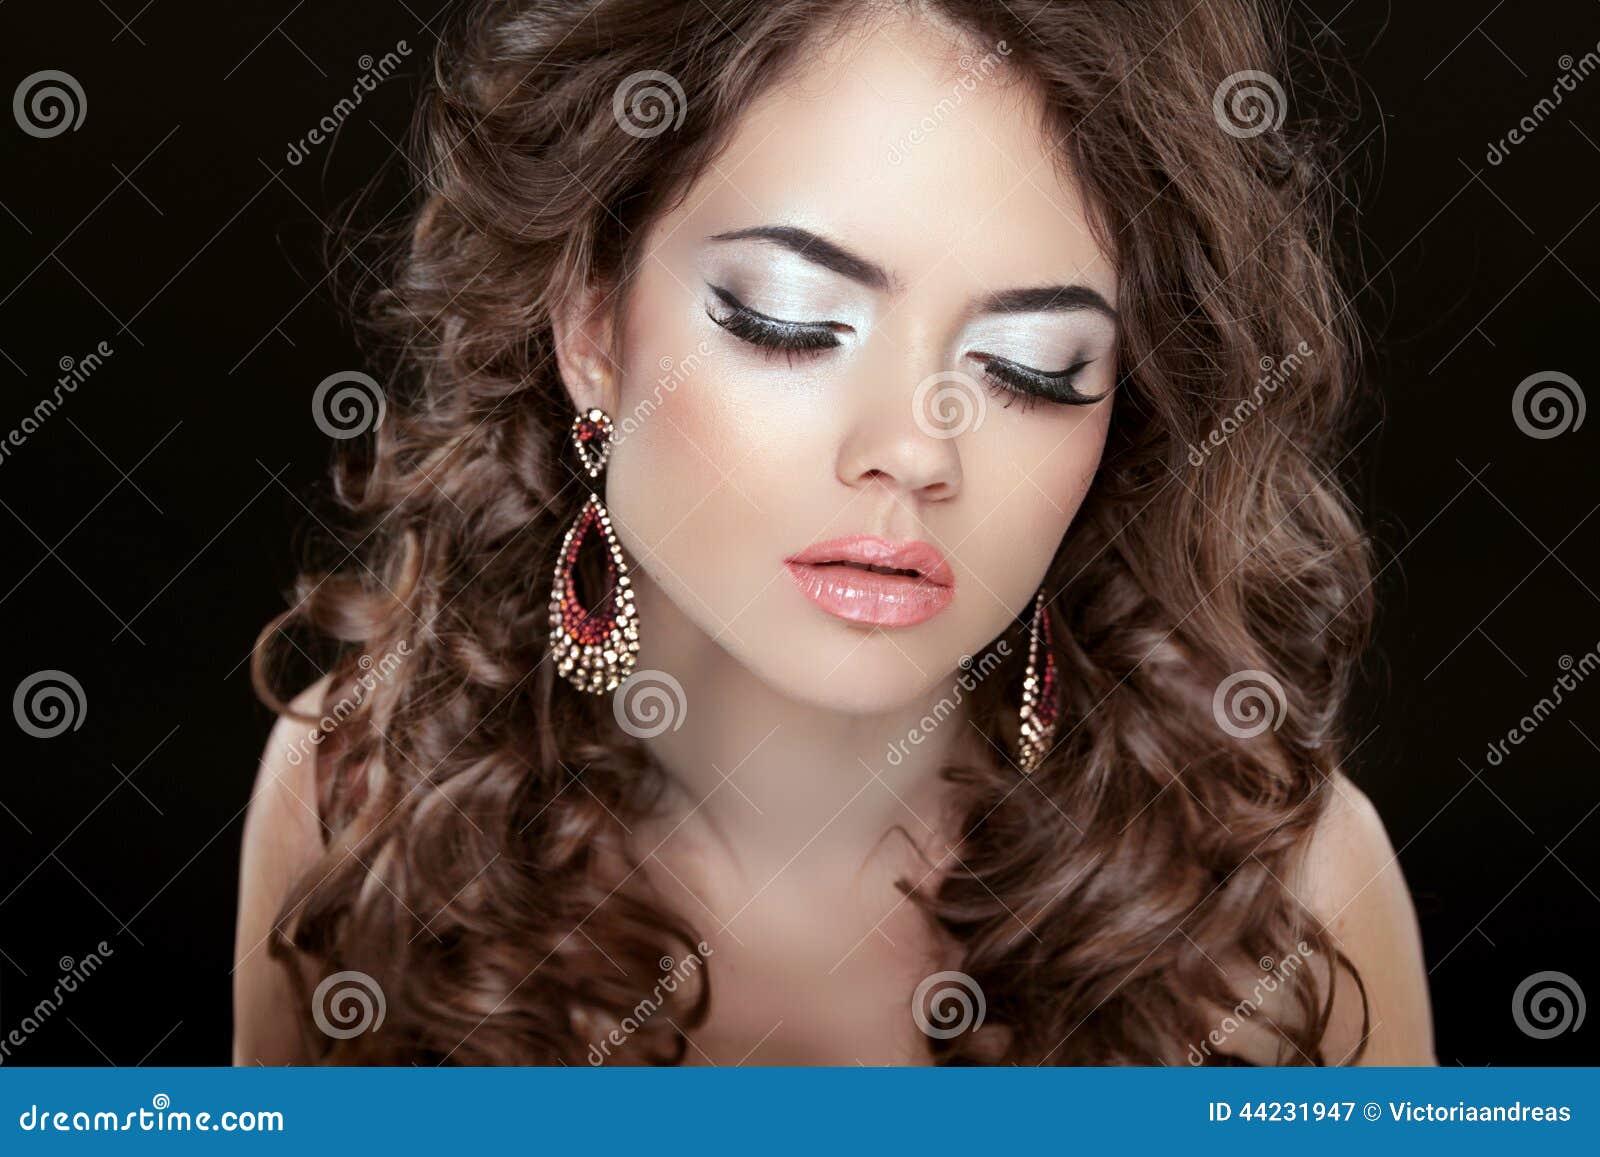 earrings girl hair makeup - photo #9